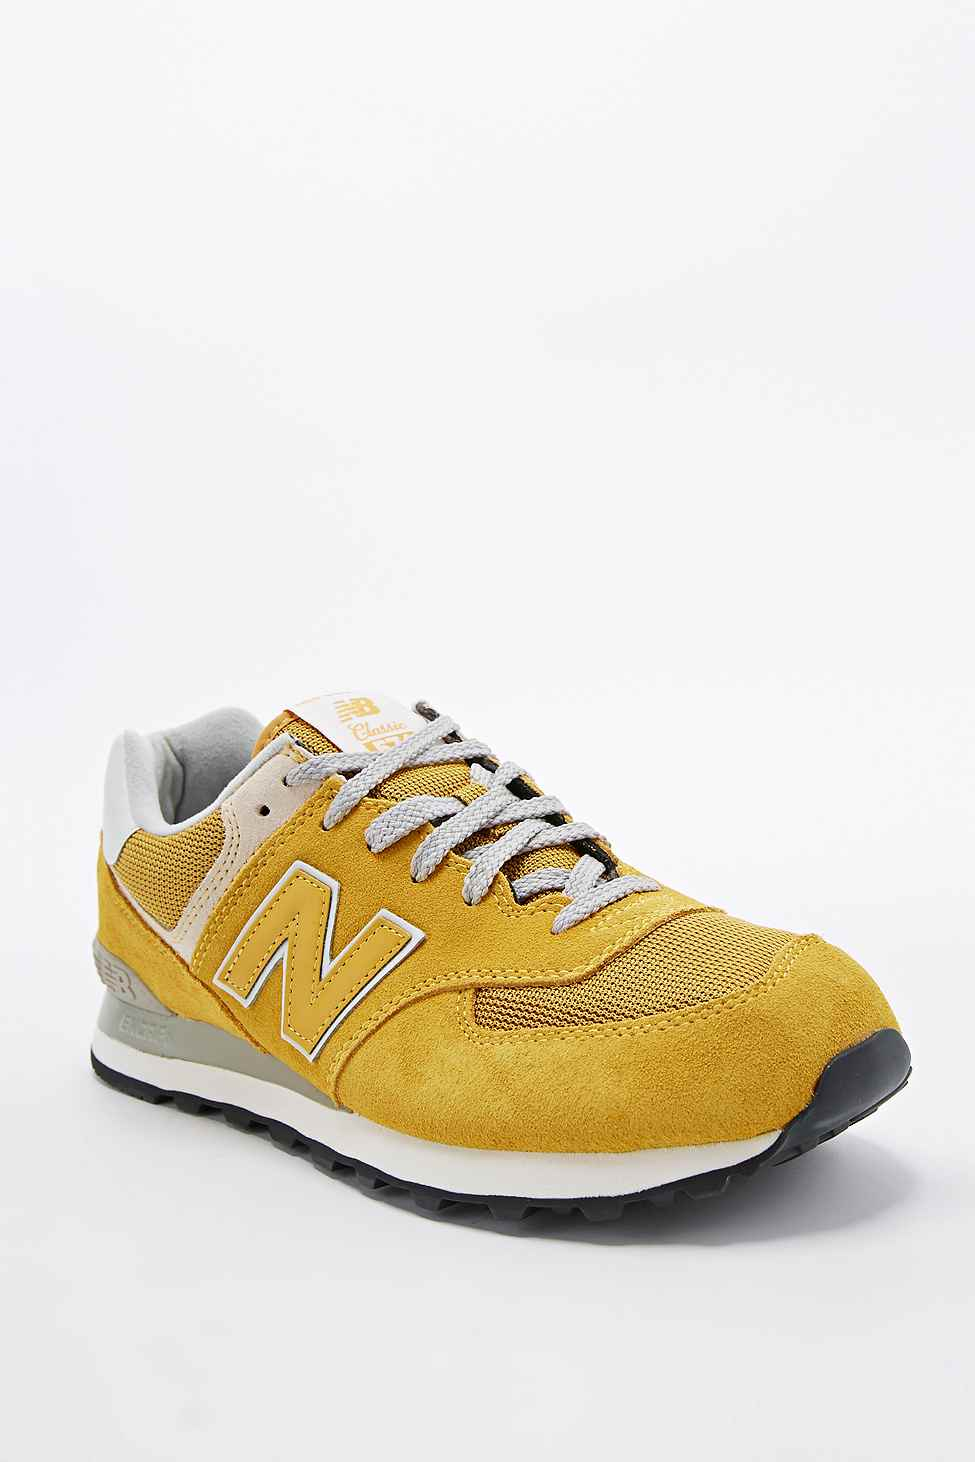 new balance 996 mustard trainers